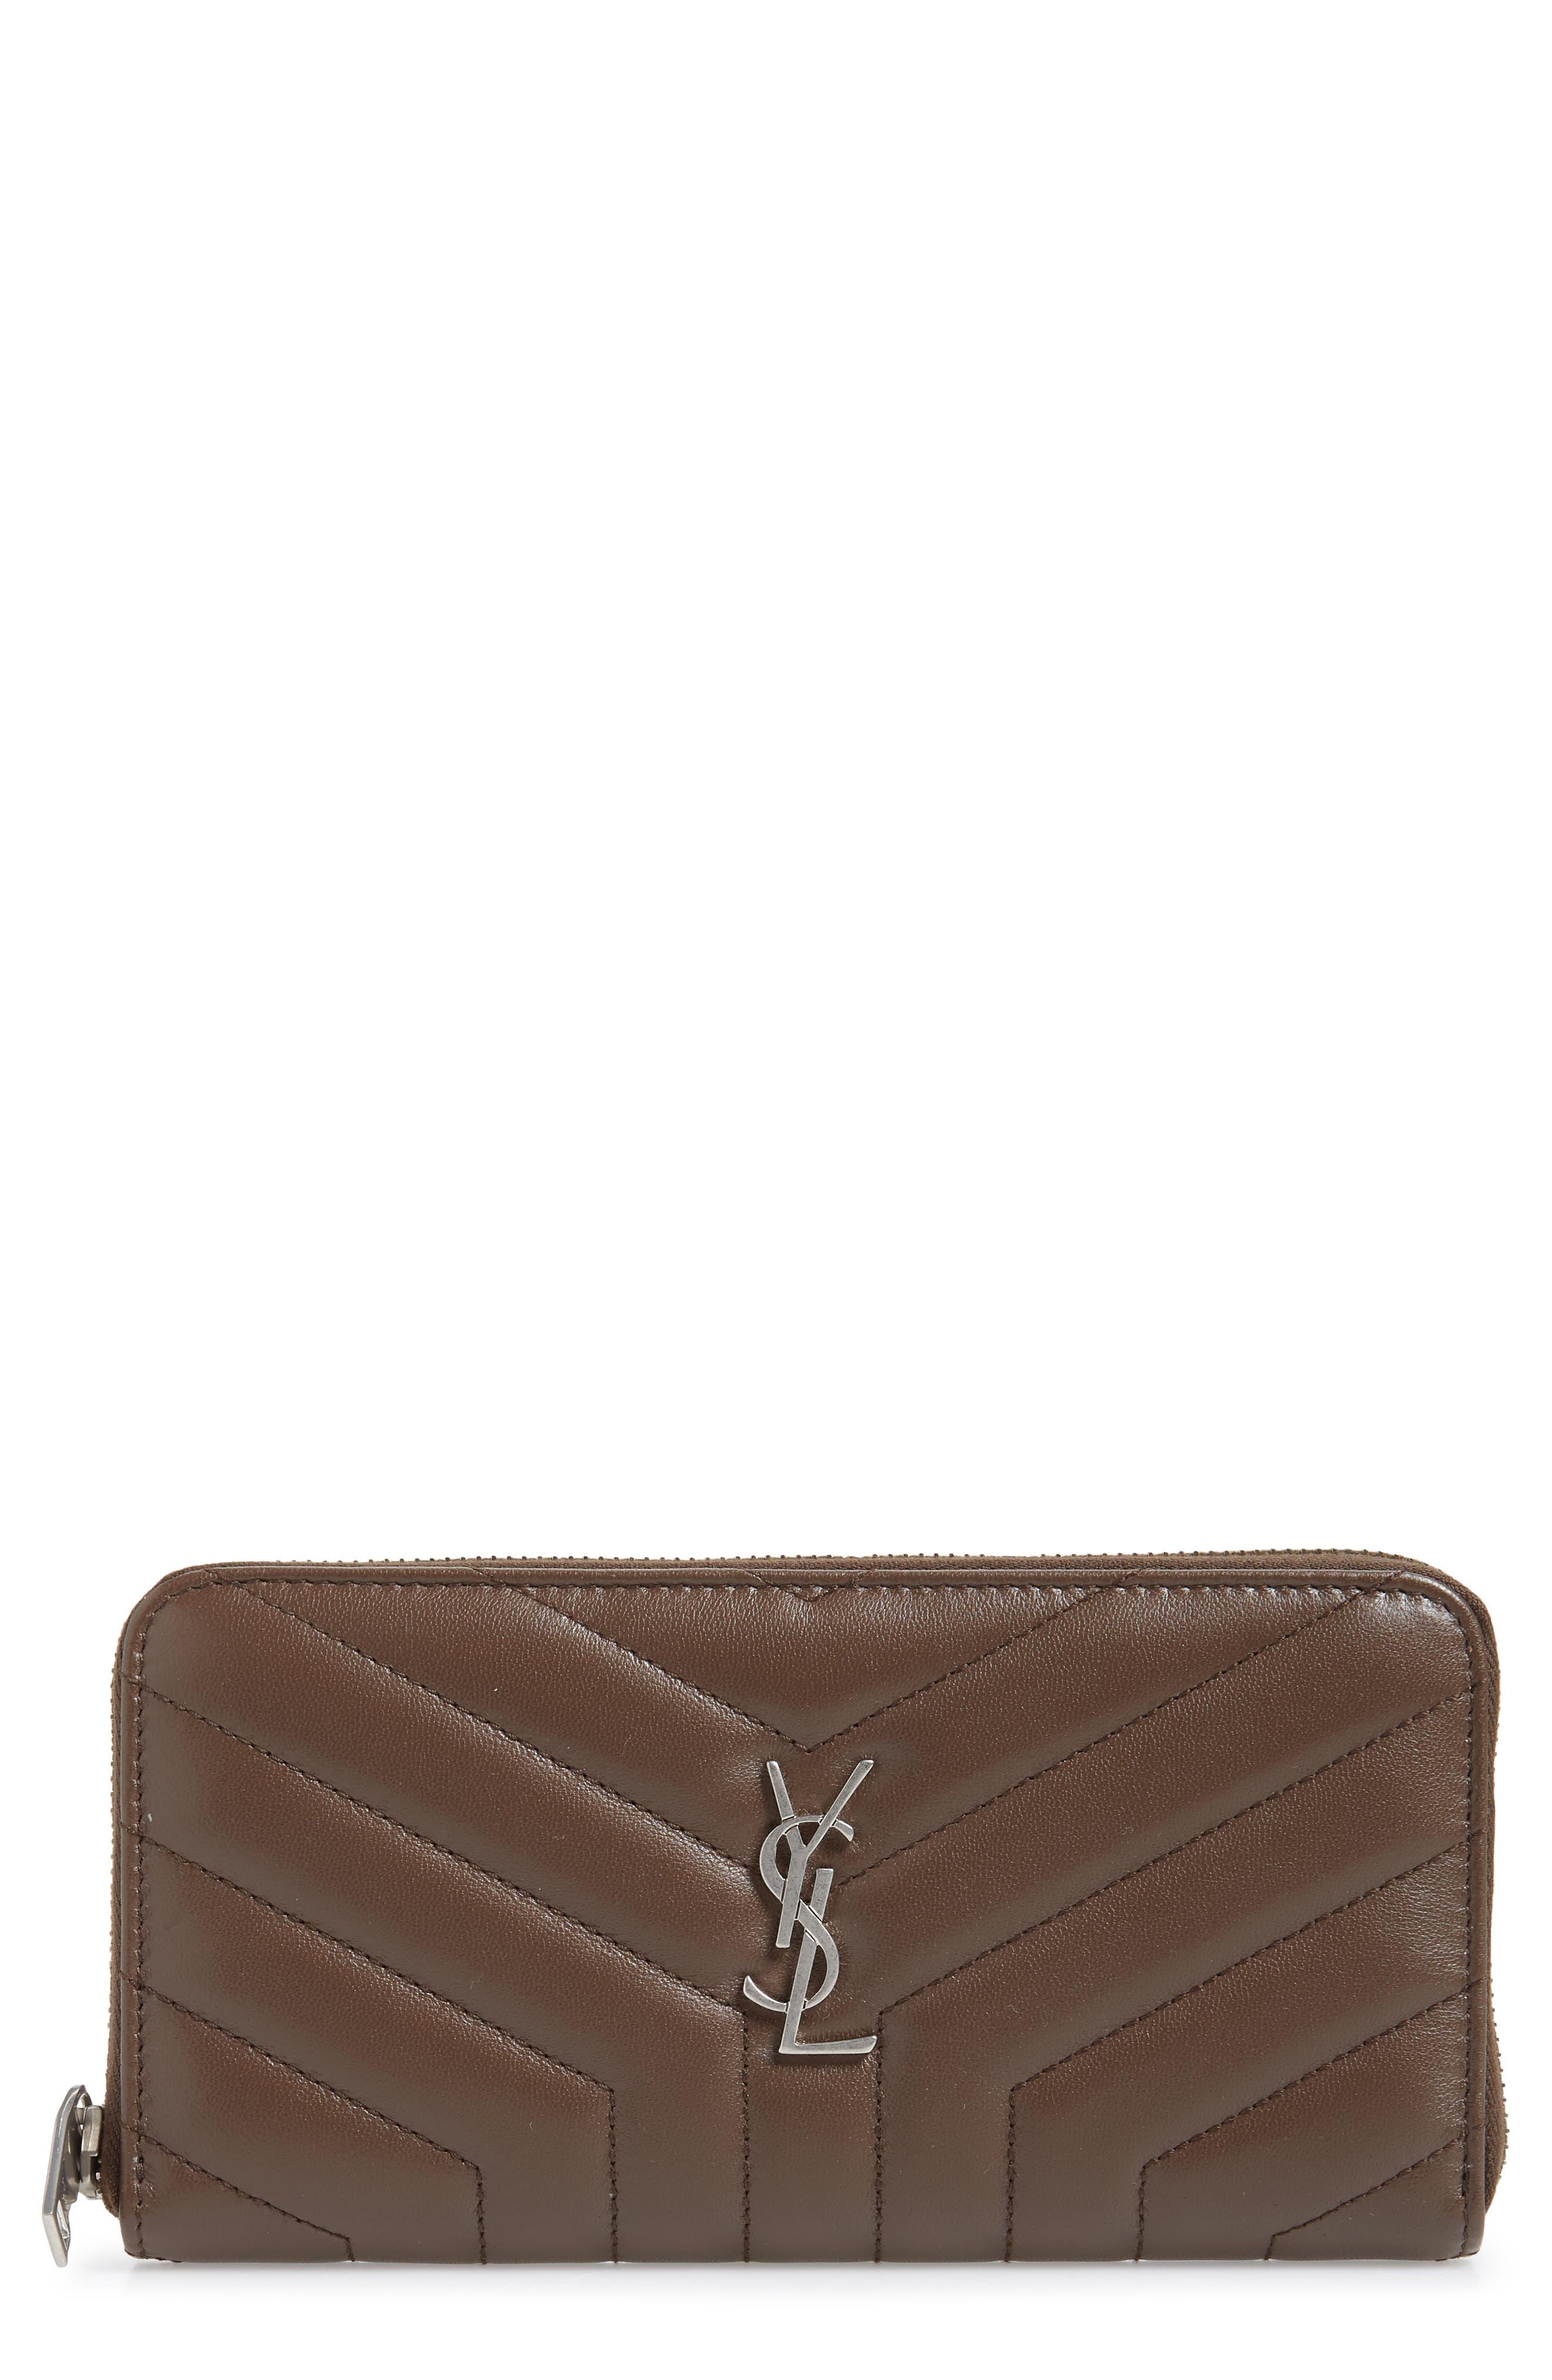 Loulou Matelassé Leather Zip-Around Wallet,                             Main thumbnail 1, color,                             FAGGIO